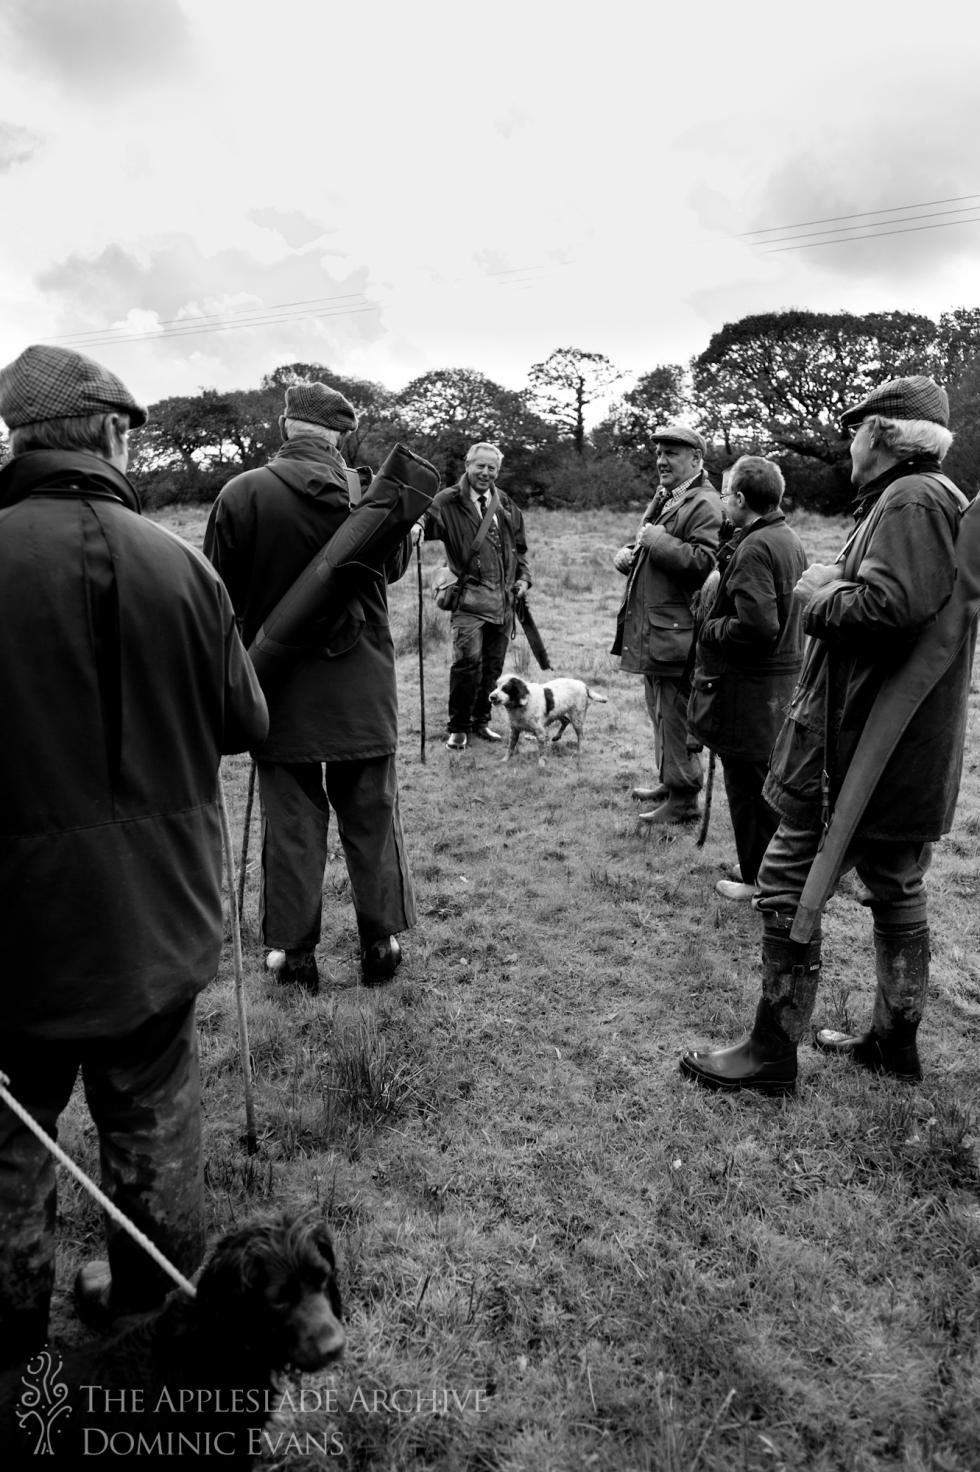 A group of shooters talking between drives, St. Enoder, Nr. Fraddon, Cornwall, 9th Nov 2013